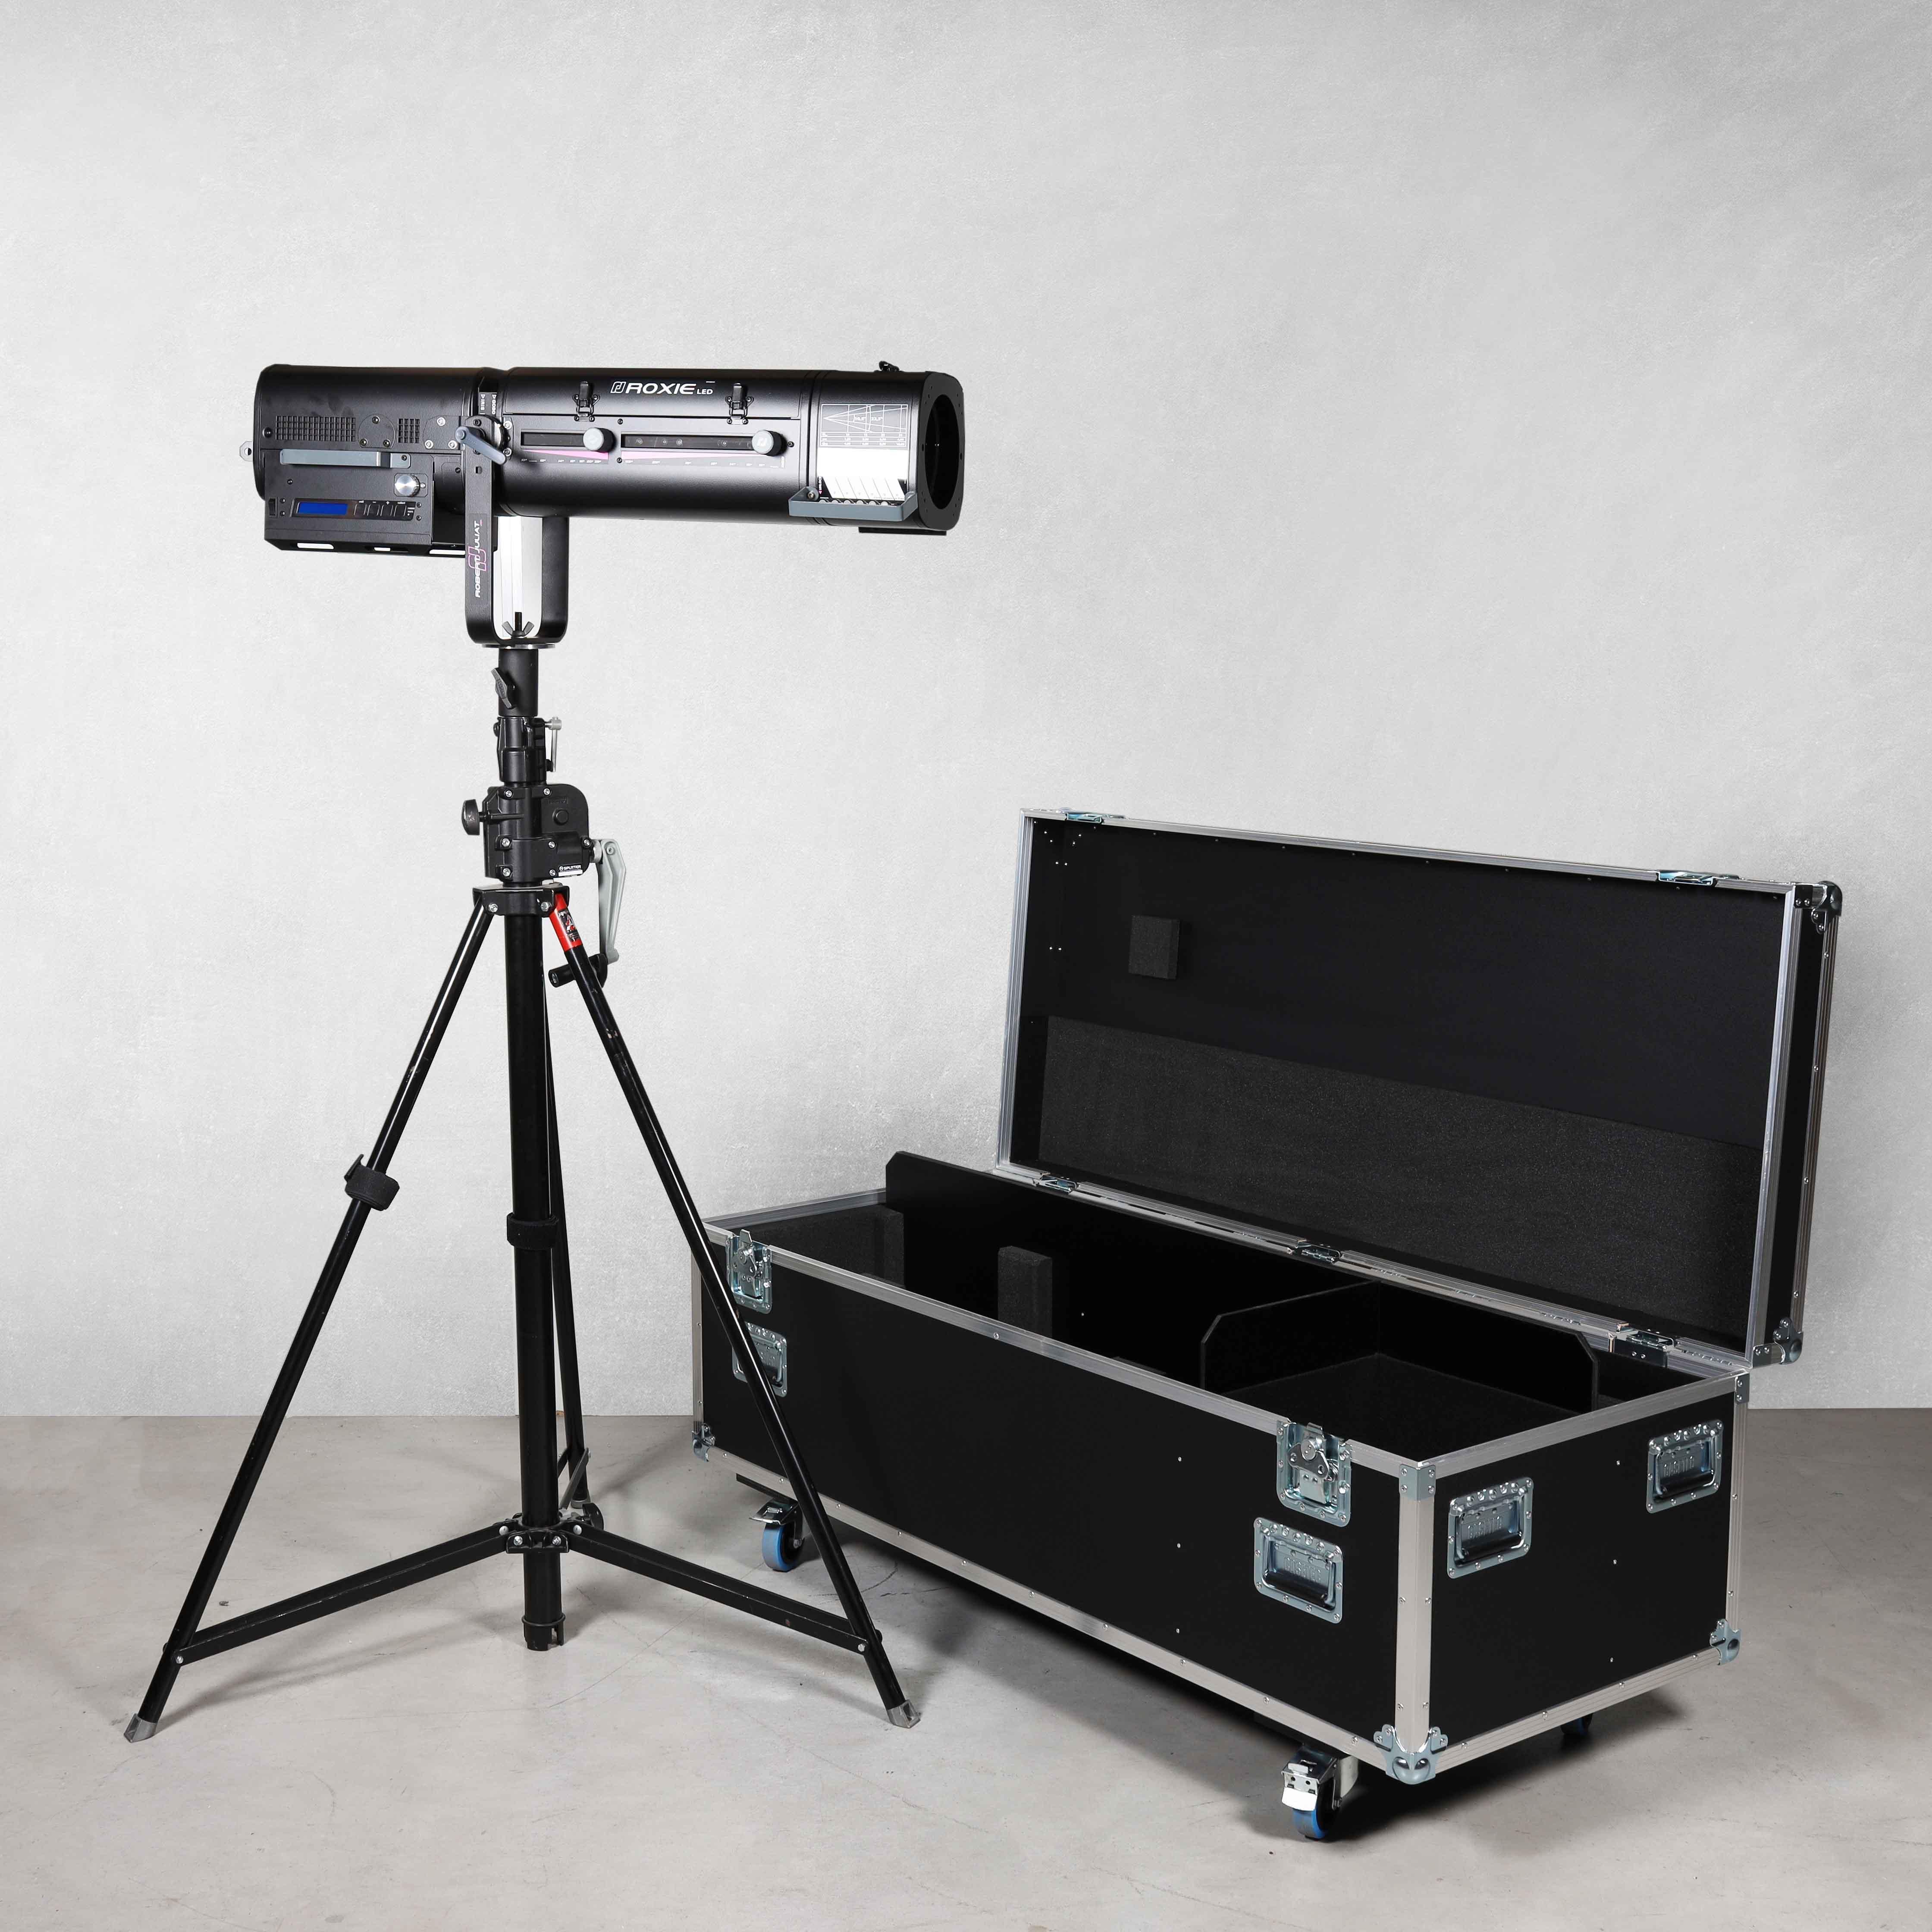 Flightcase für 1x Verfolger Robert Juliat ROXIE2 300W I66-2WW LED mit Stativ